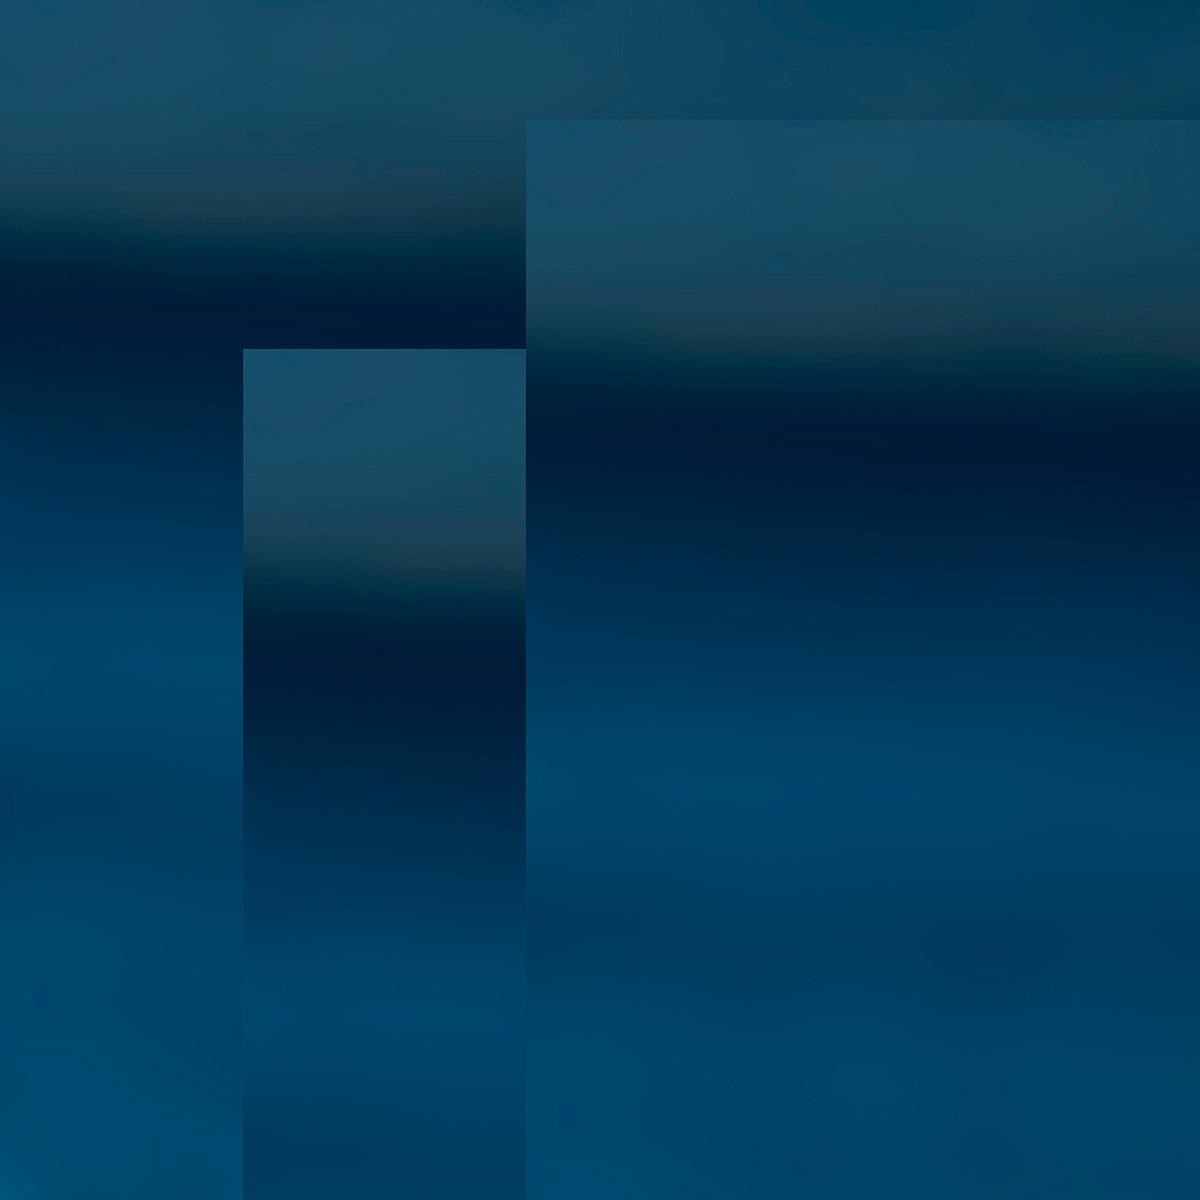 Blurry Blues 2